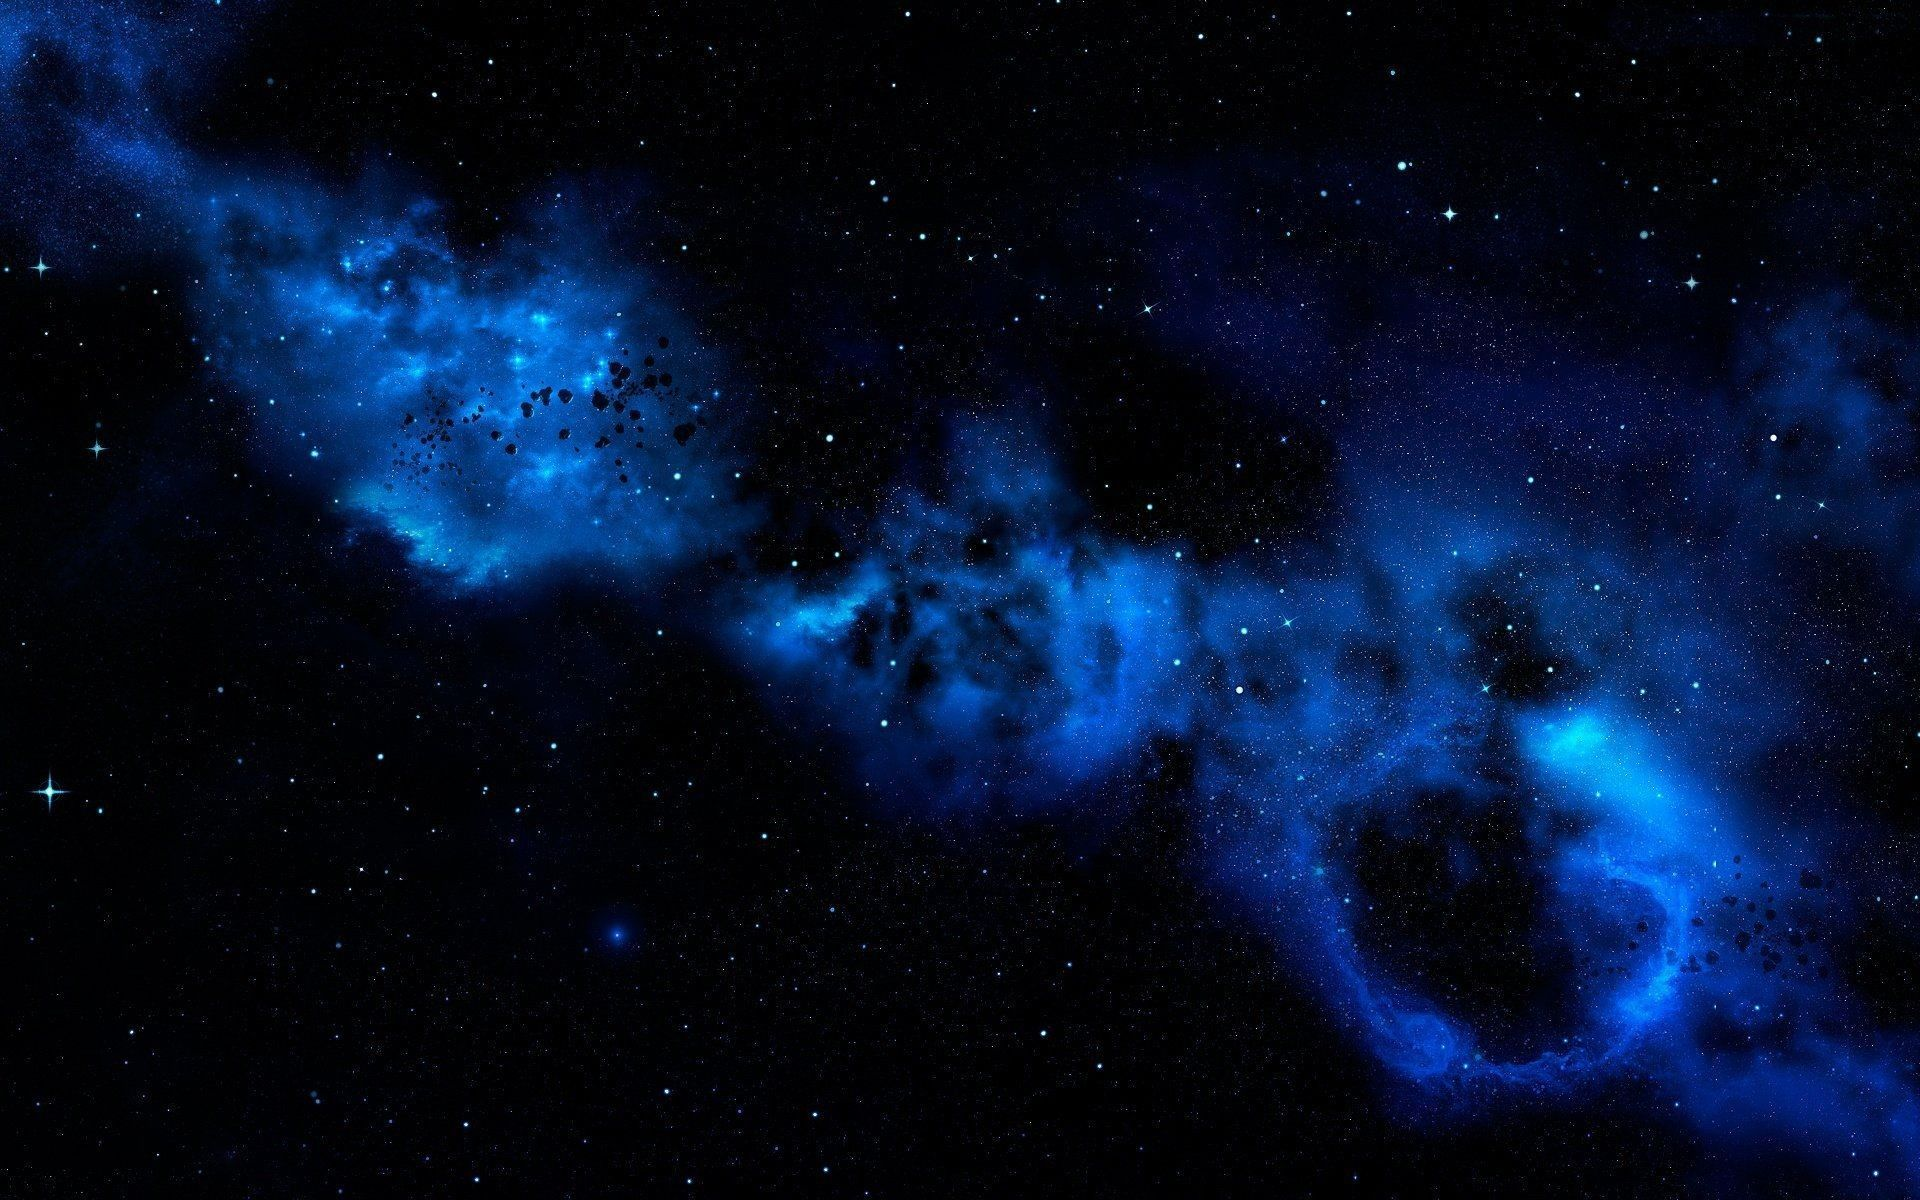 Black Blue Galaxy Wallpapers Top Free Black Blue Galaxy Backgrounds Wallpaperaccess Blue Galaxy Wallpaper Galaxy Wallpaper Galaxy Background Ideas for galaxy dark blue wallpaper hd